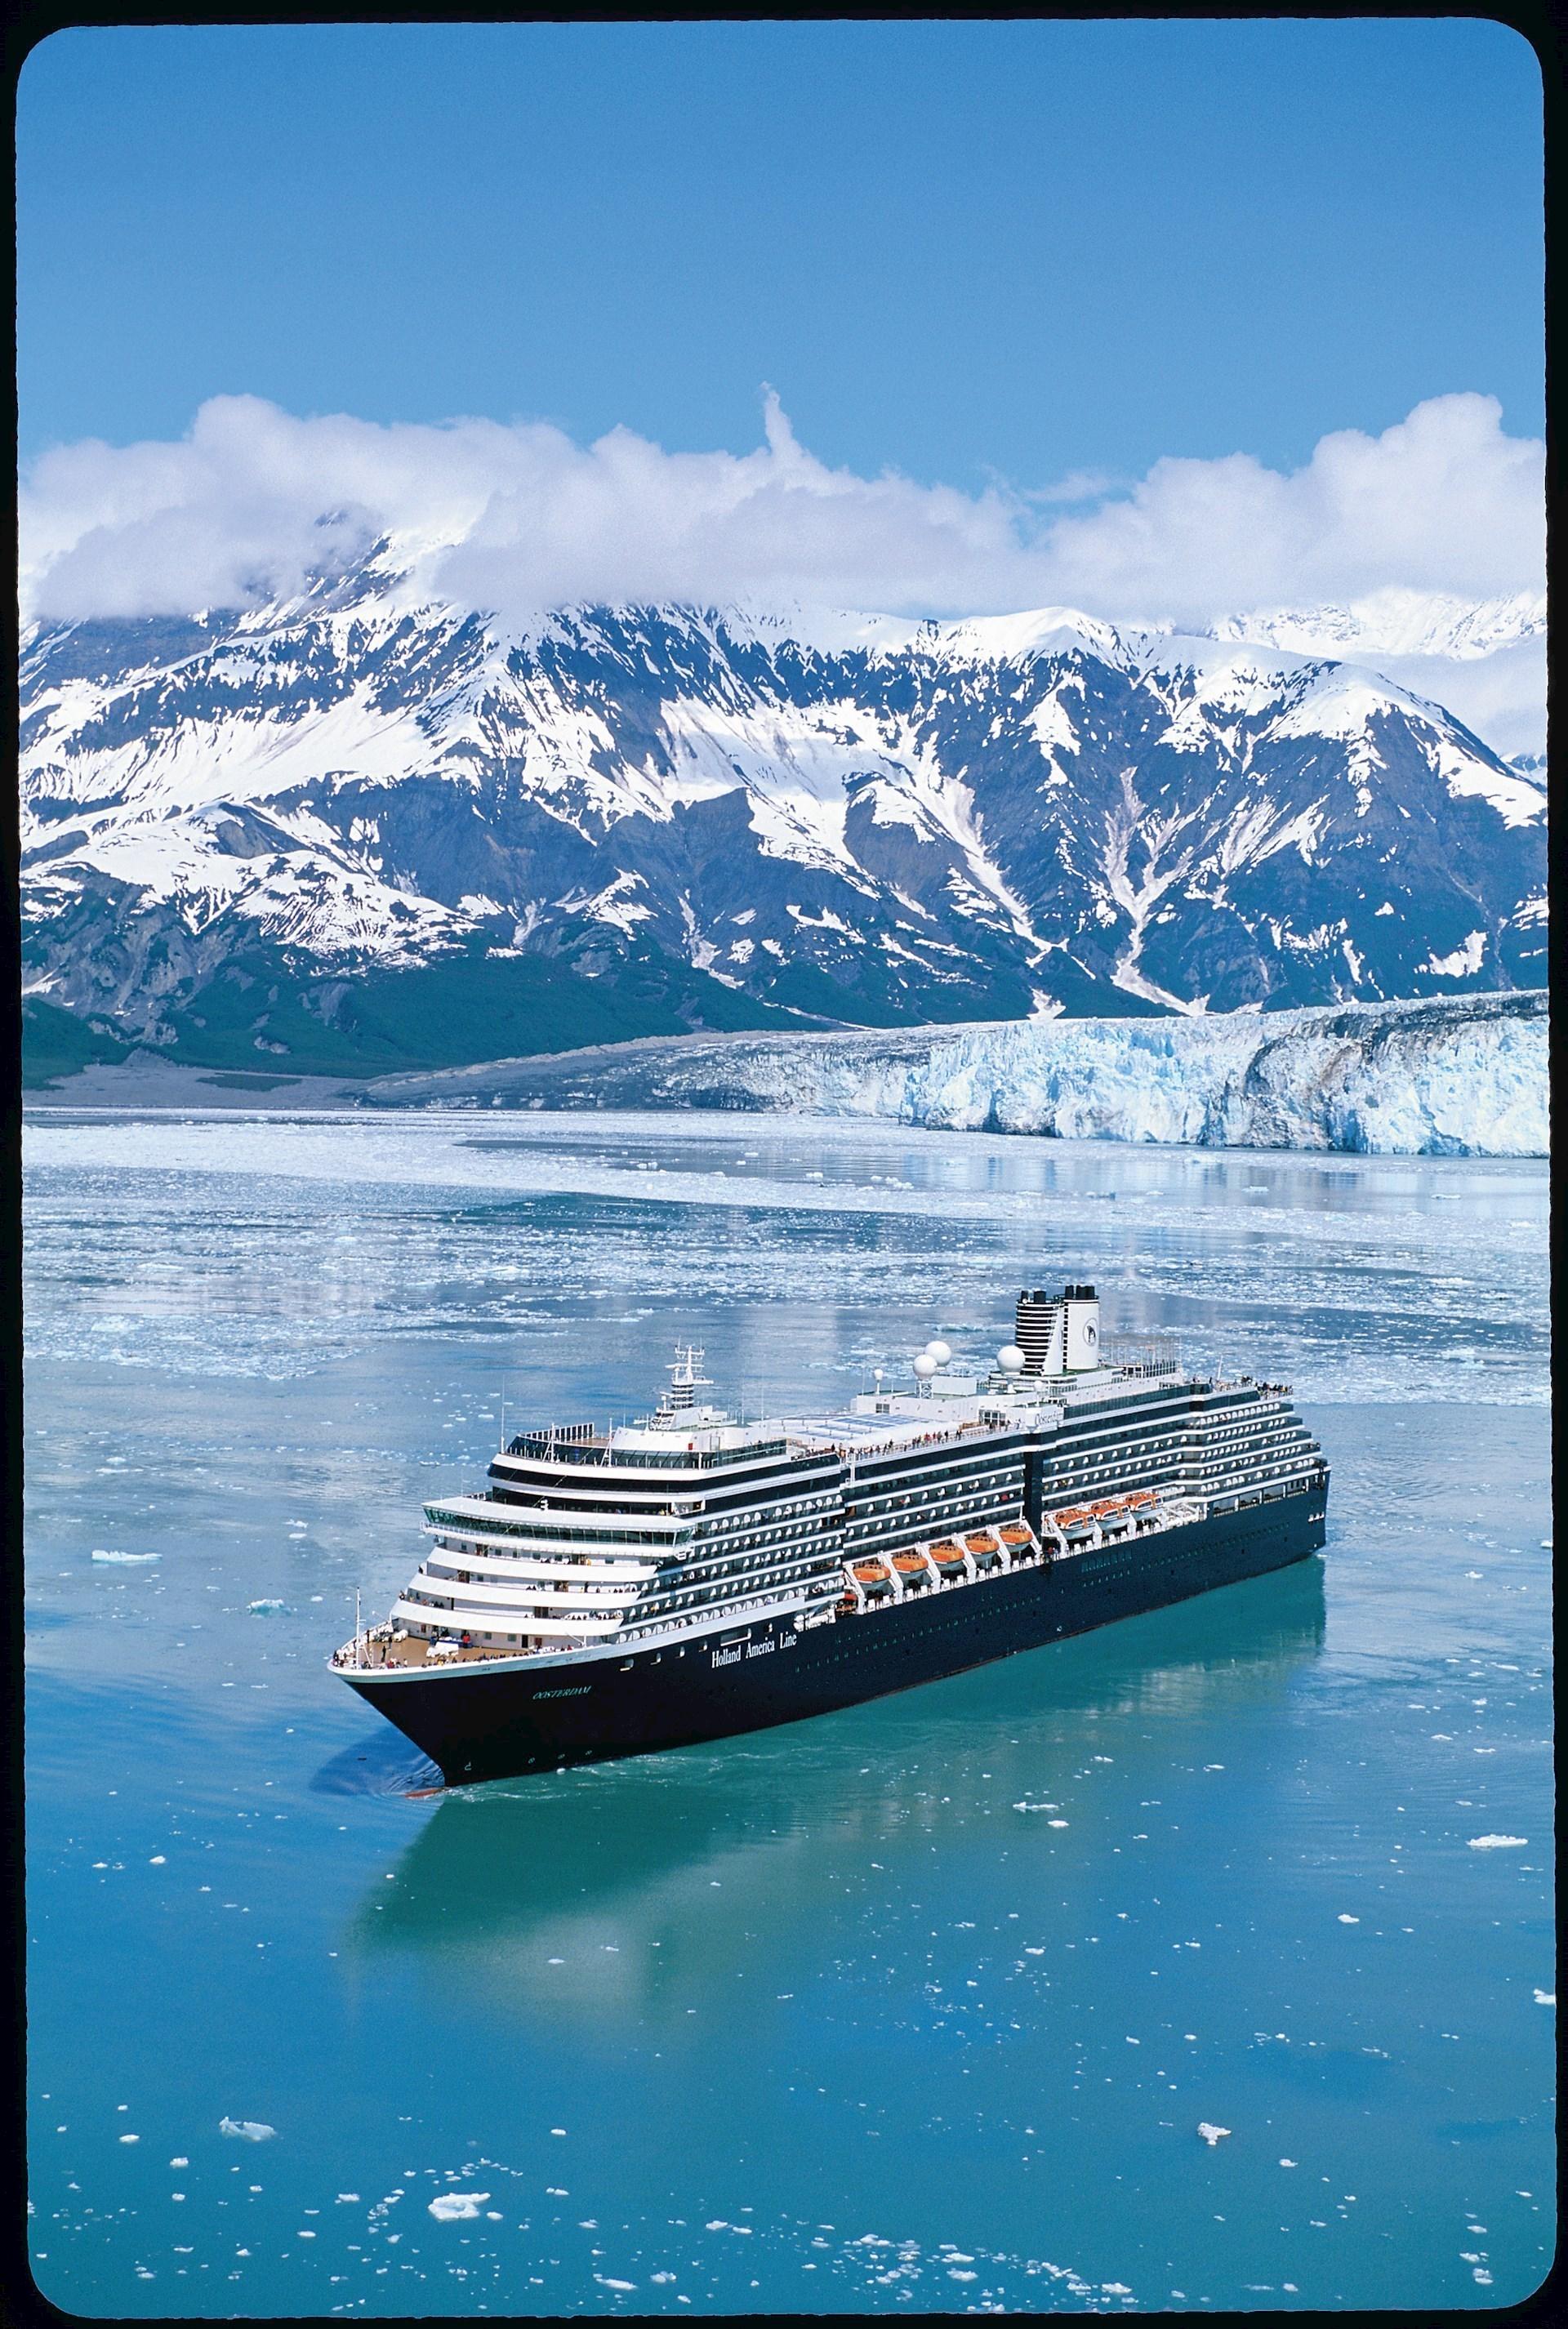 Vancouver Alaska Cruise & Rocky Mountaineer Rail Journey